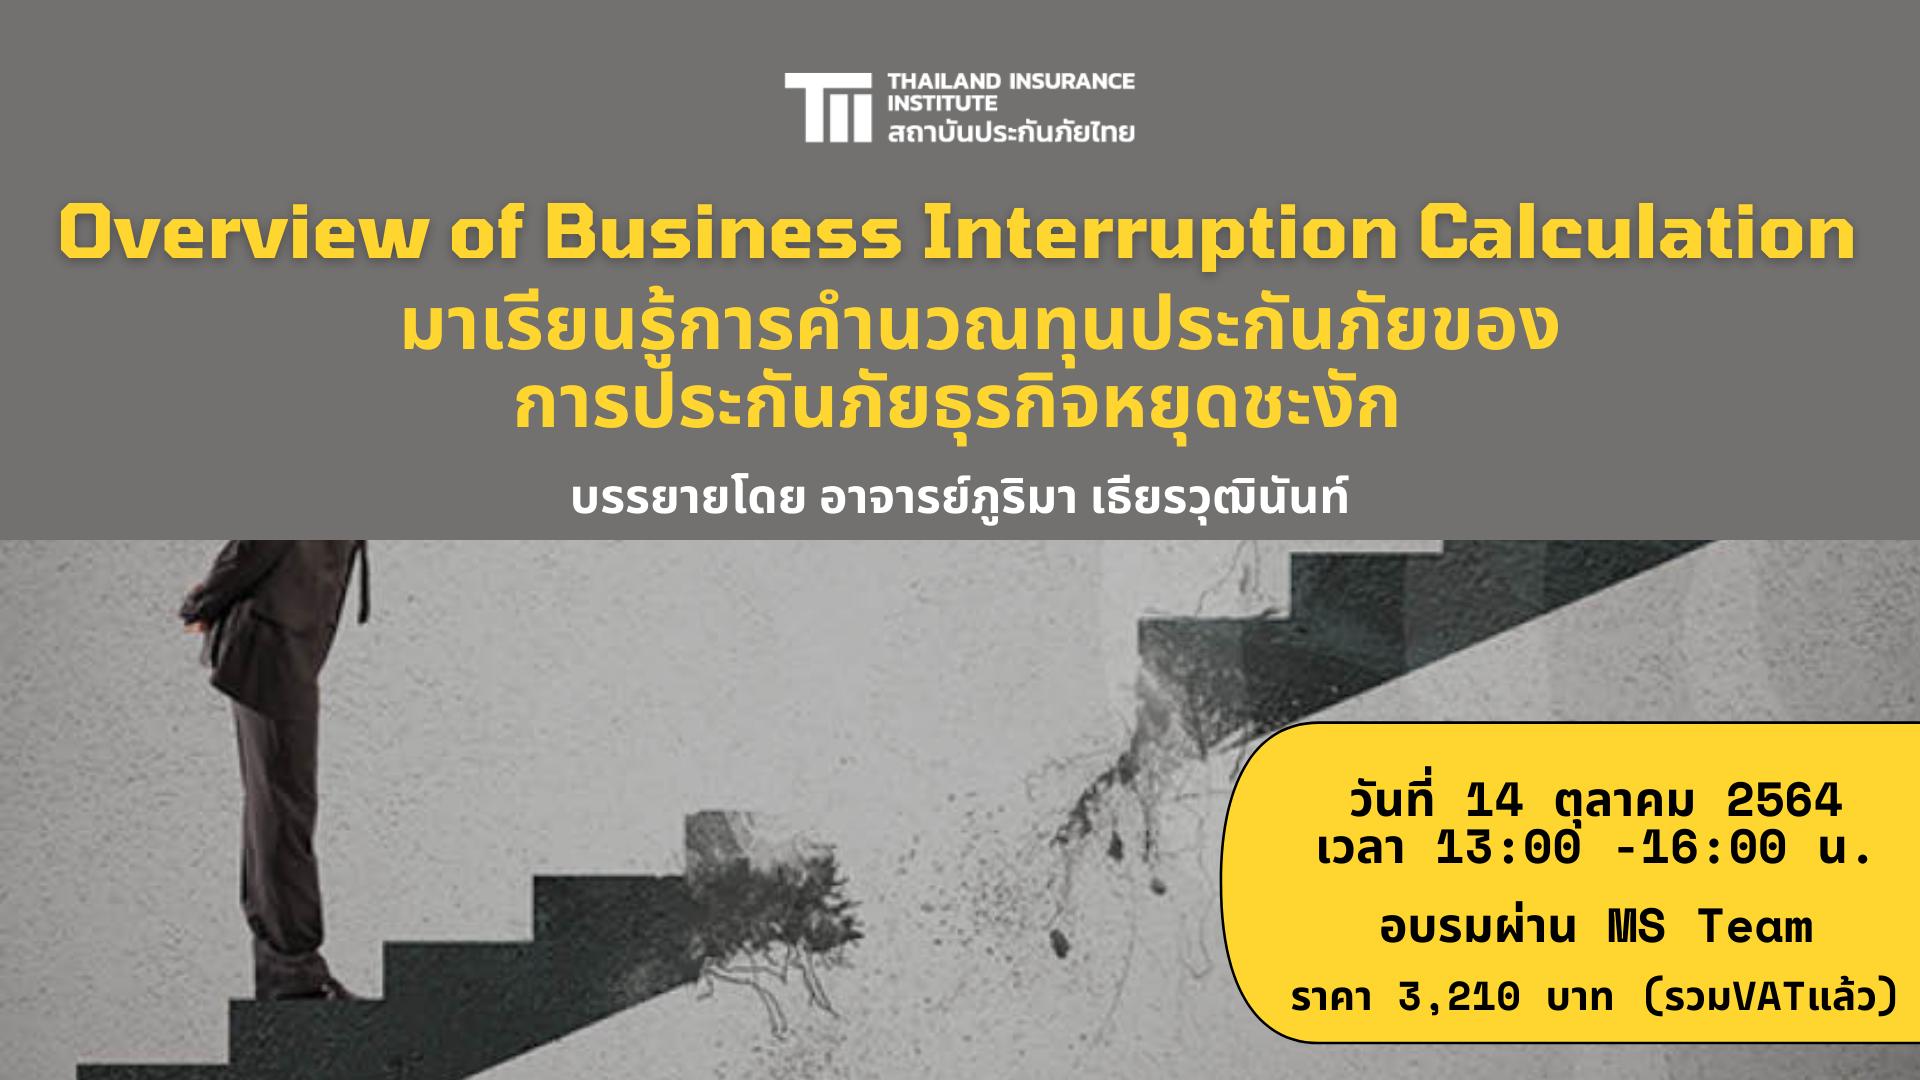 PR_Overview of Business Interruption Calculation